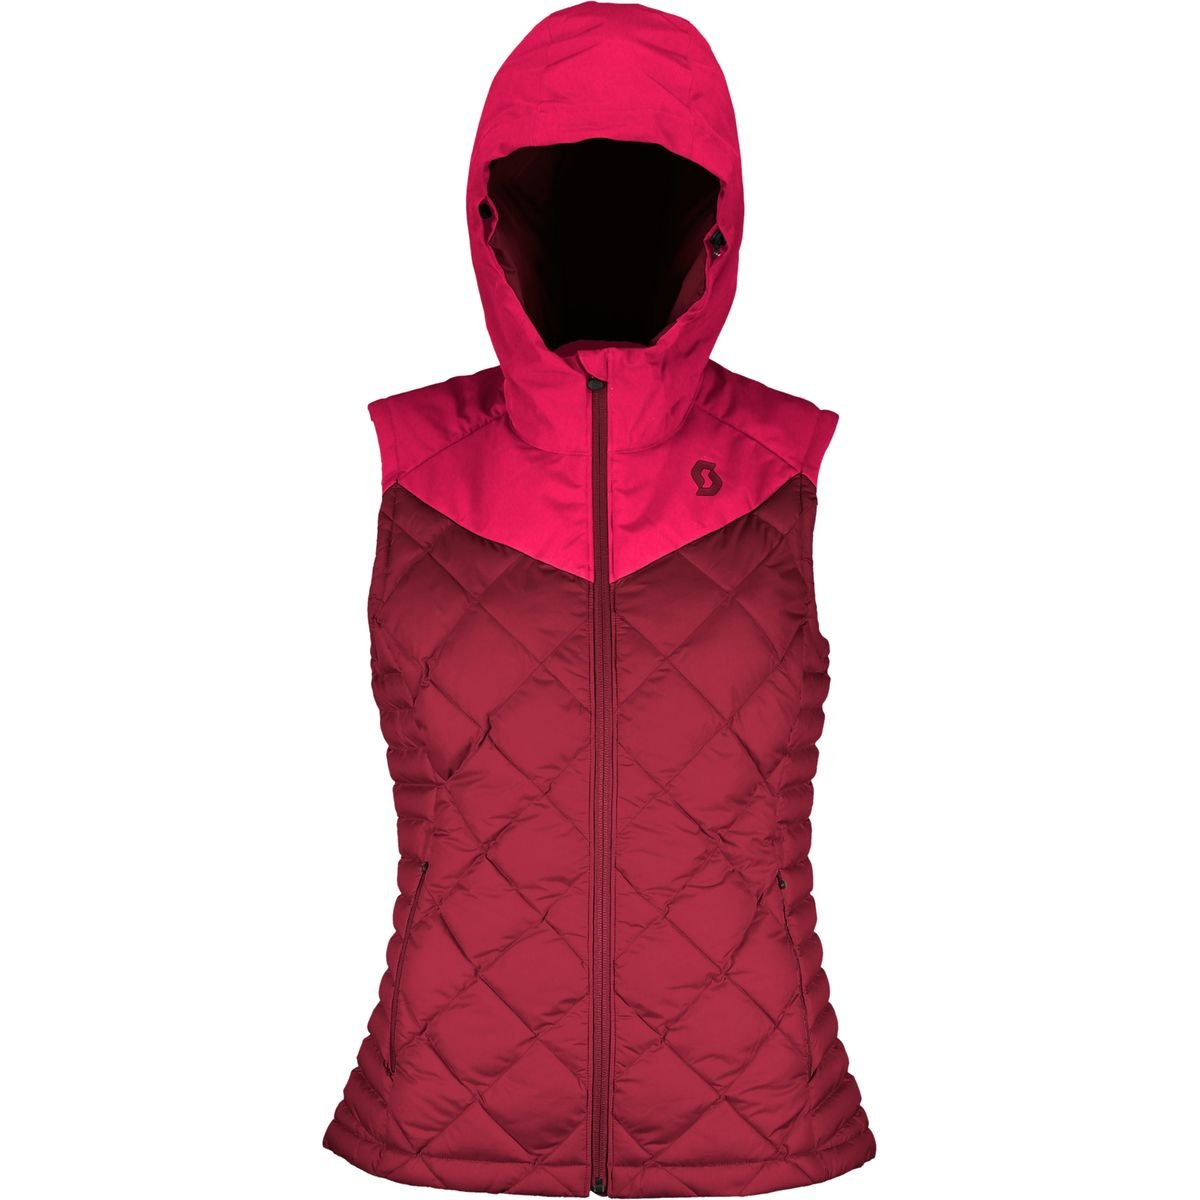 Scott Insuloft 3M Vest - Women's Ruby Red/Mahogany Red, US XL/EU XXL